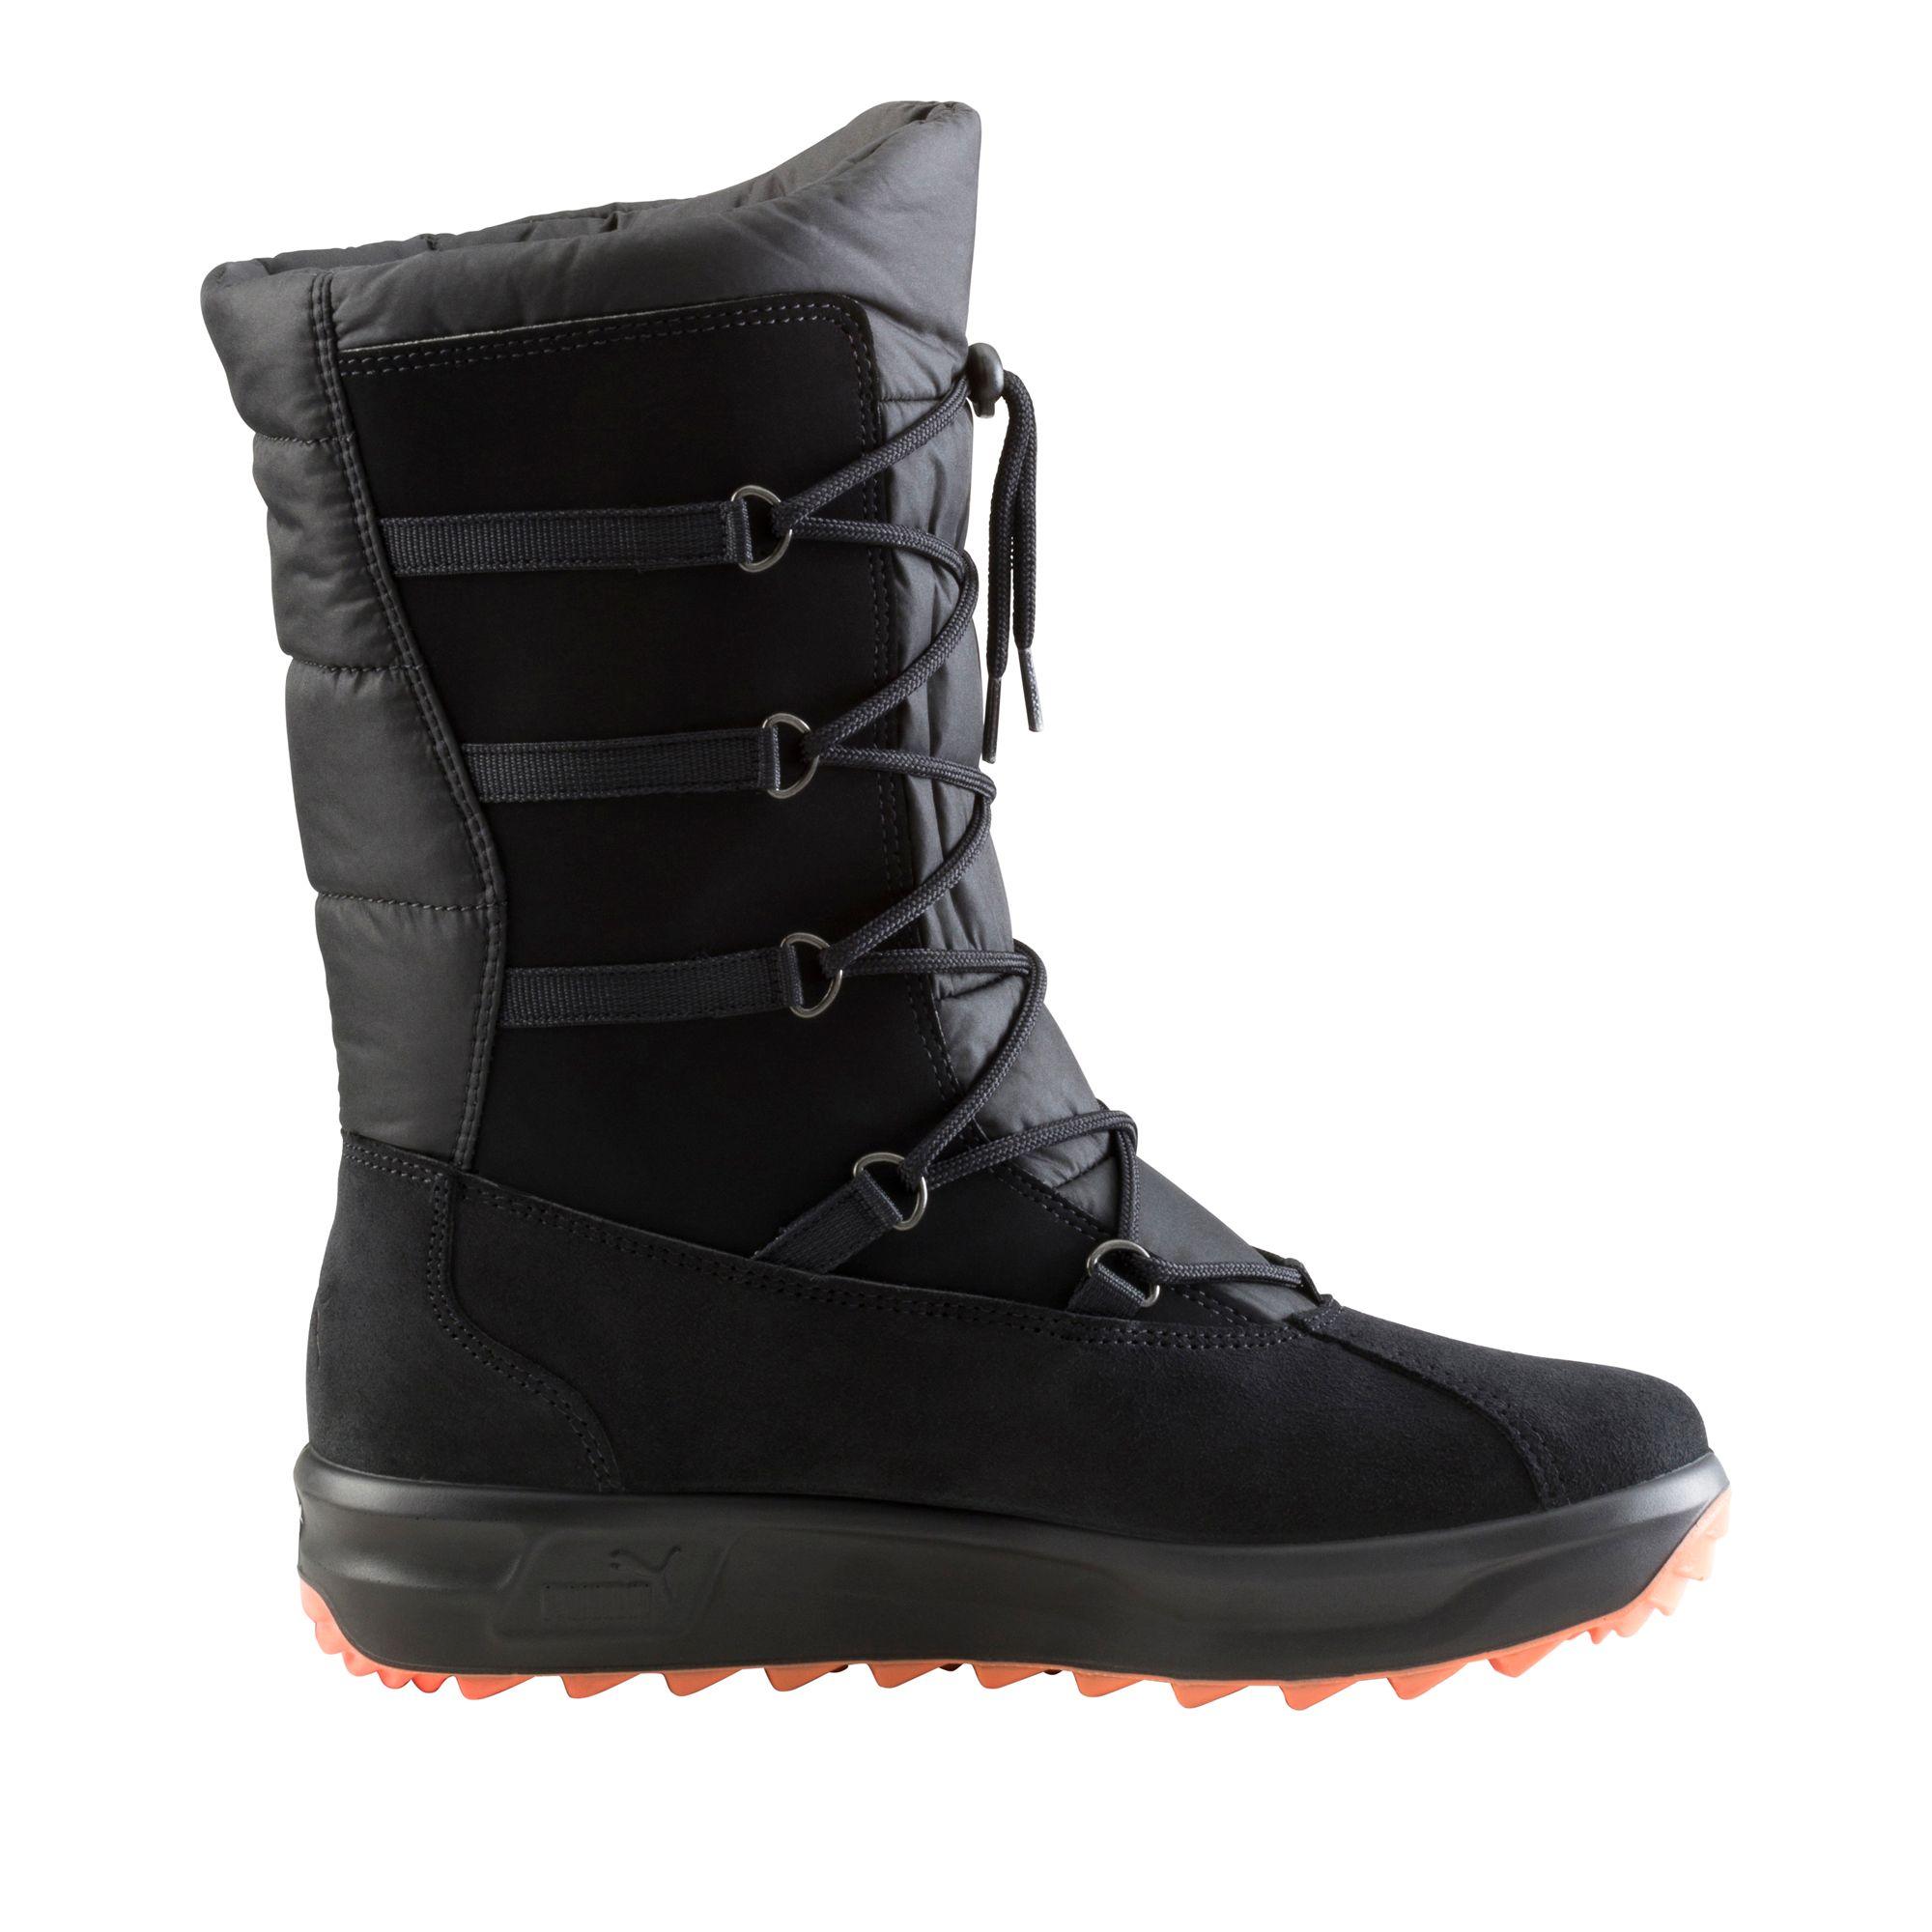 PUMA Aronia Soffice GTX® Snow Boots Footwear Winter Shoes